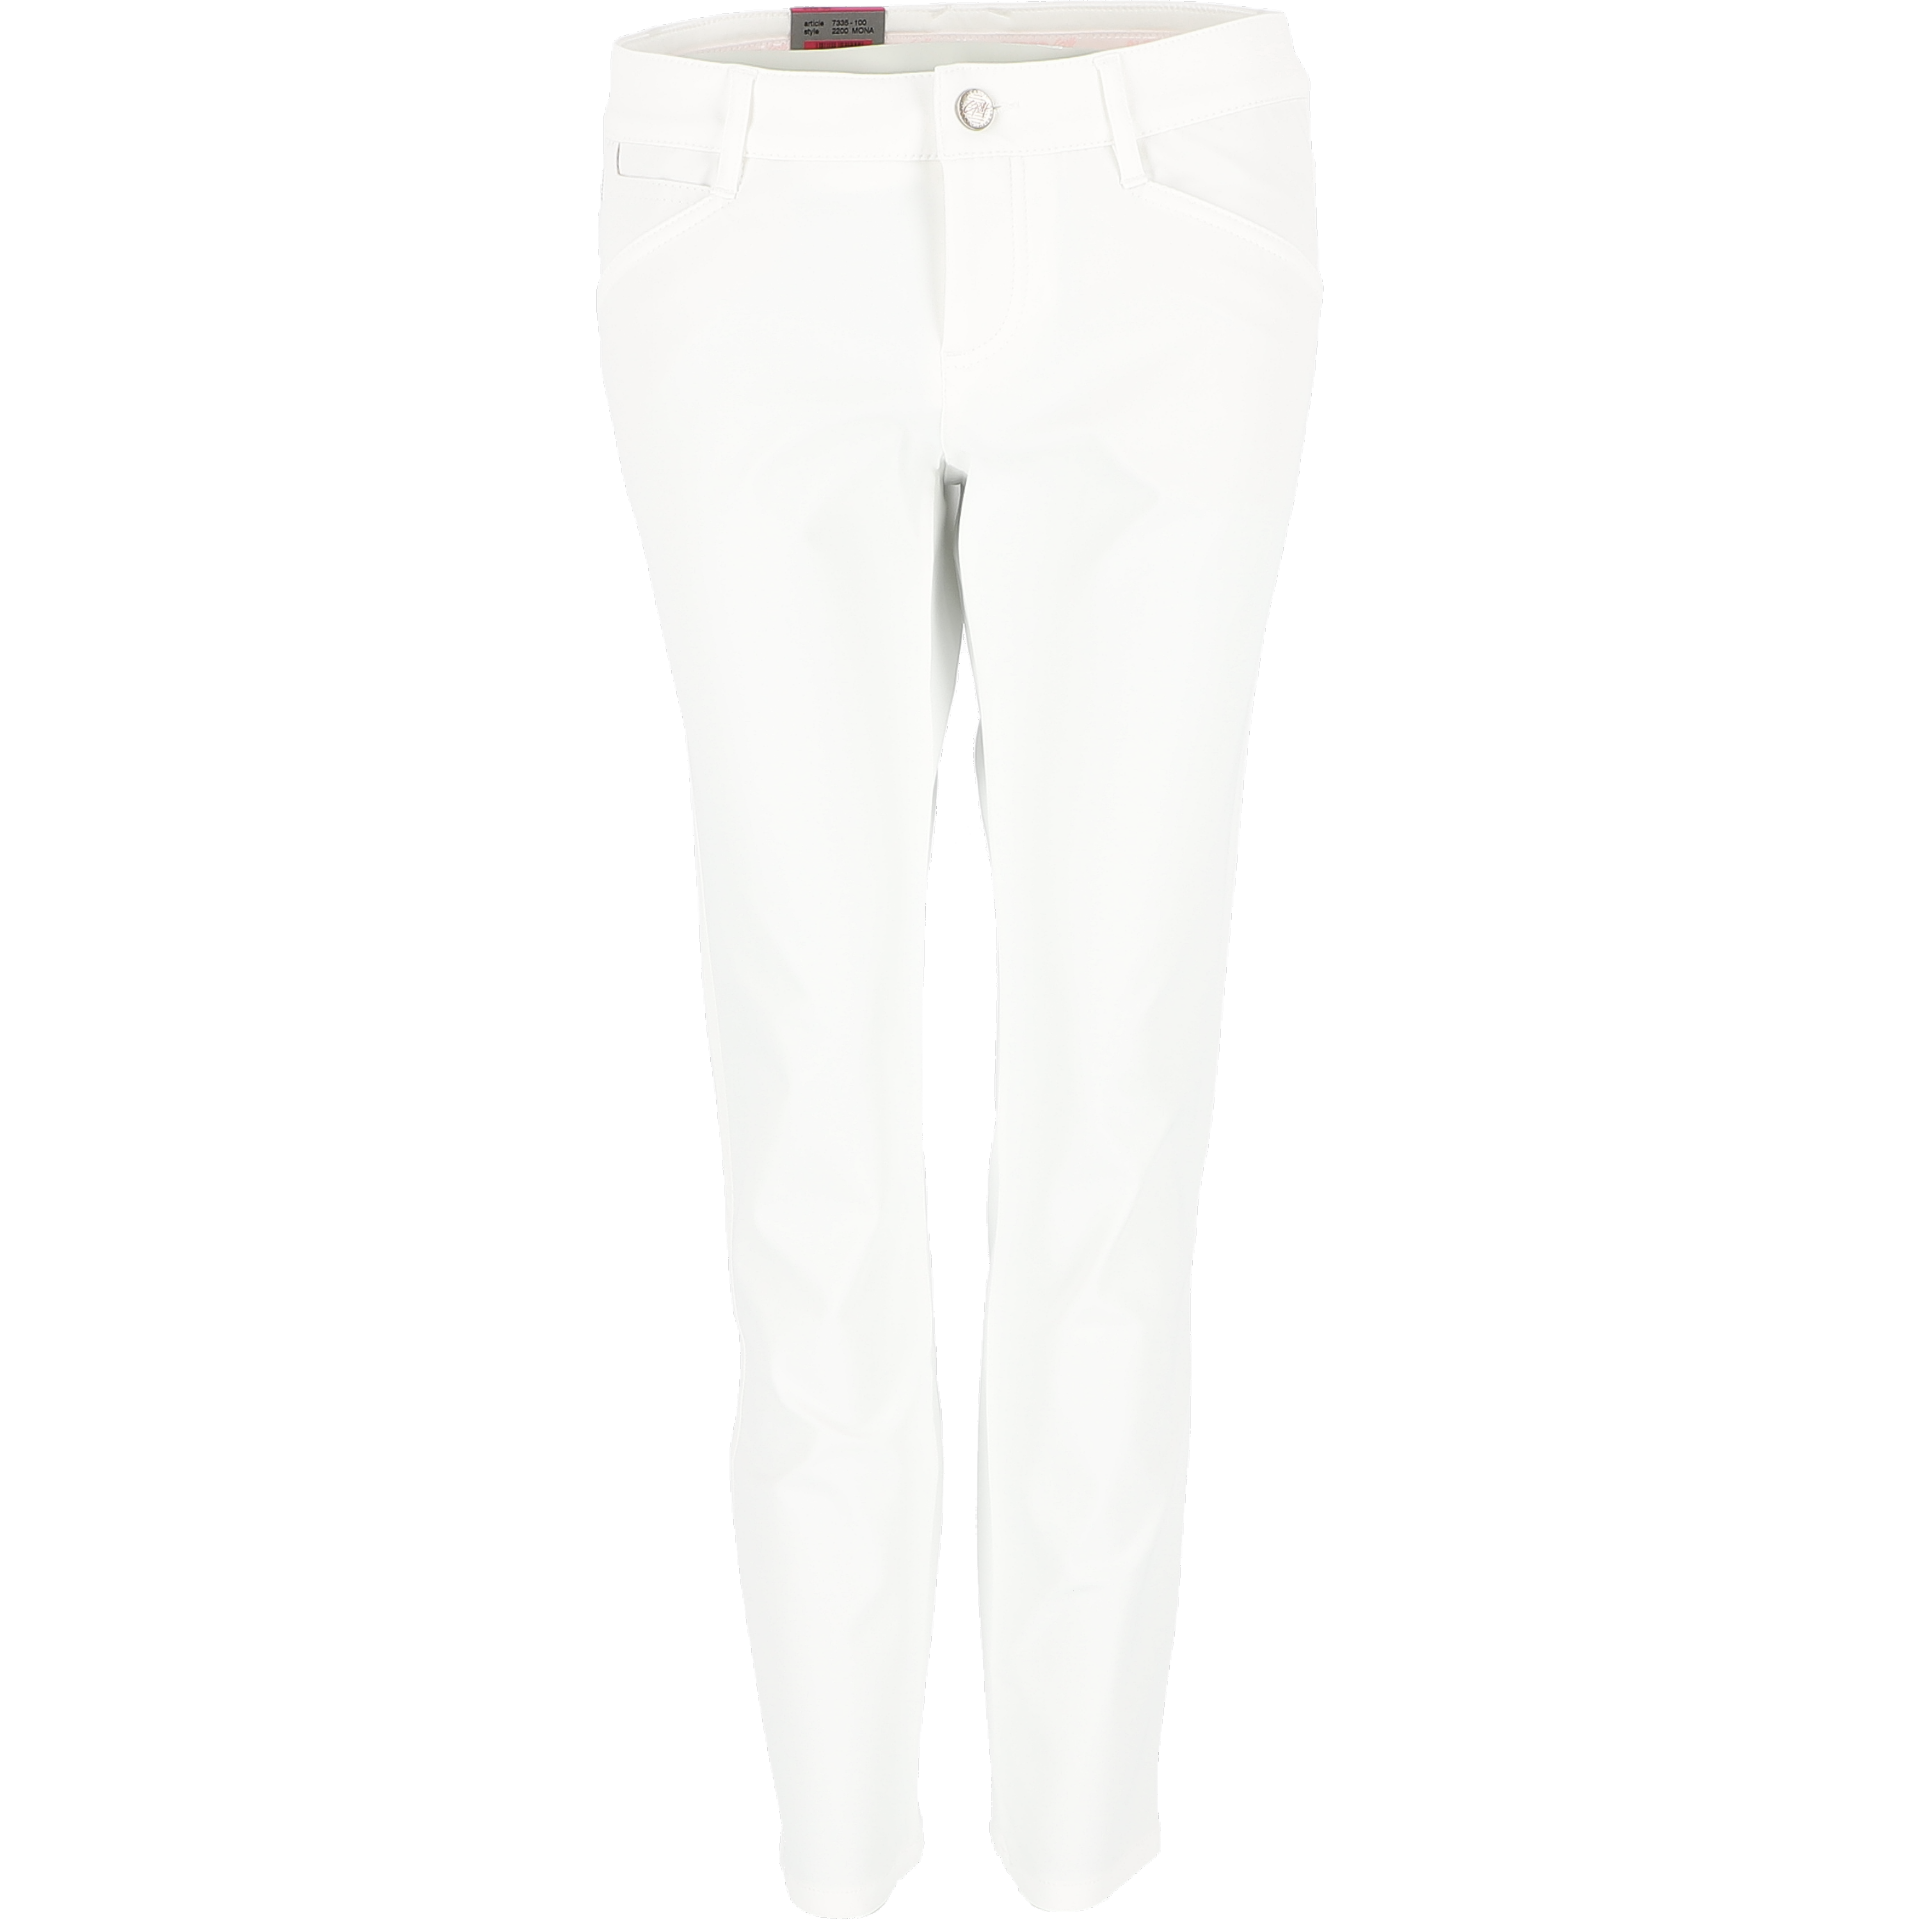 MONA Hose - 3xDRY Cooler, weiß